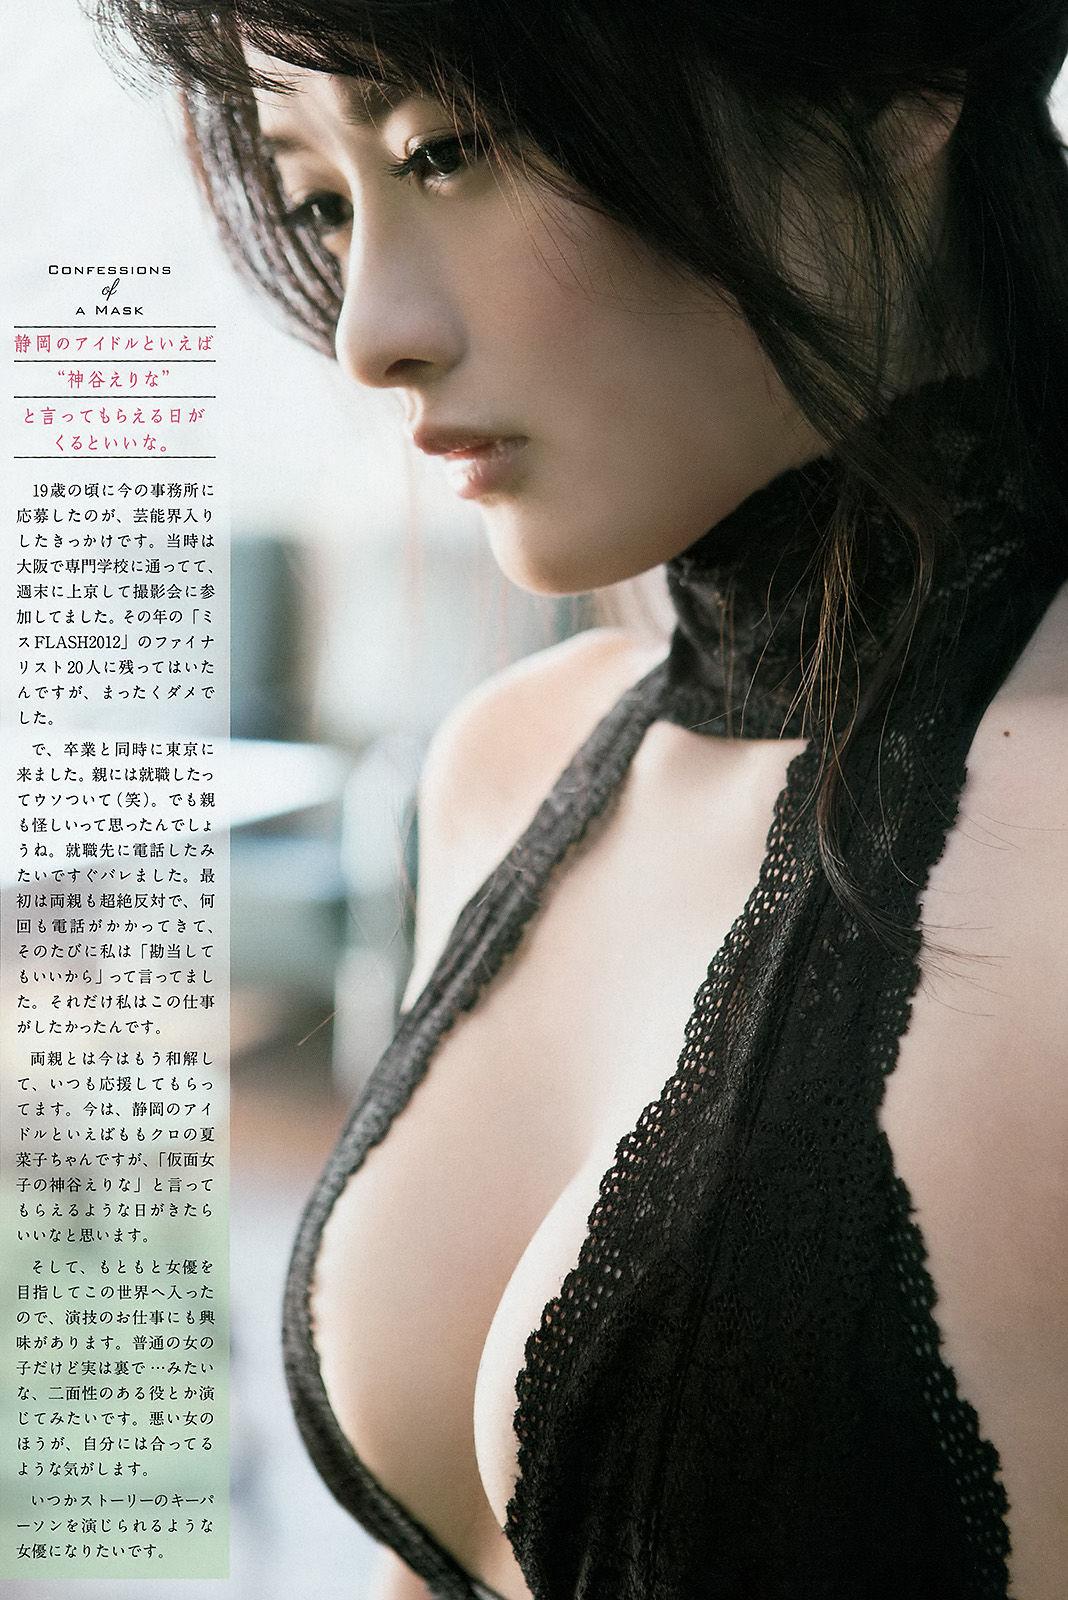 [Weekly Big Comic Spirits杂志写真]神谷绘里奈(神谷えりな)超高清写真大图片(9P)|950热度